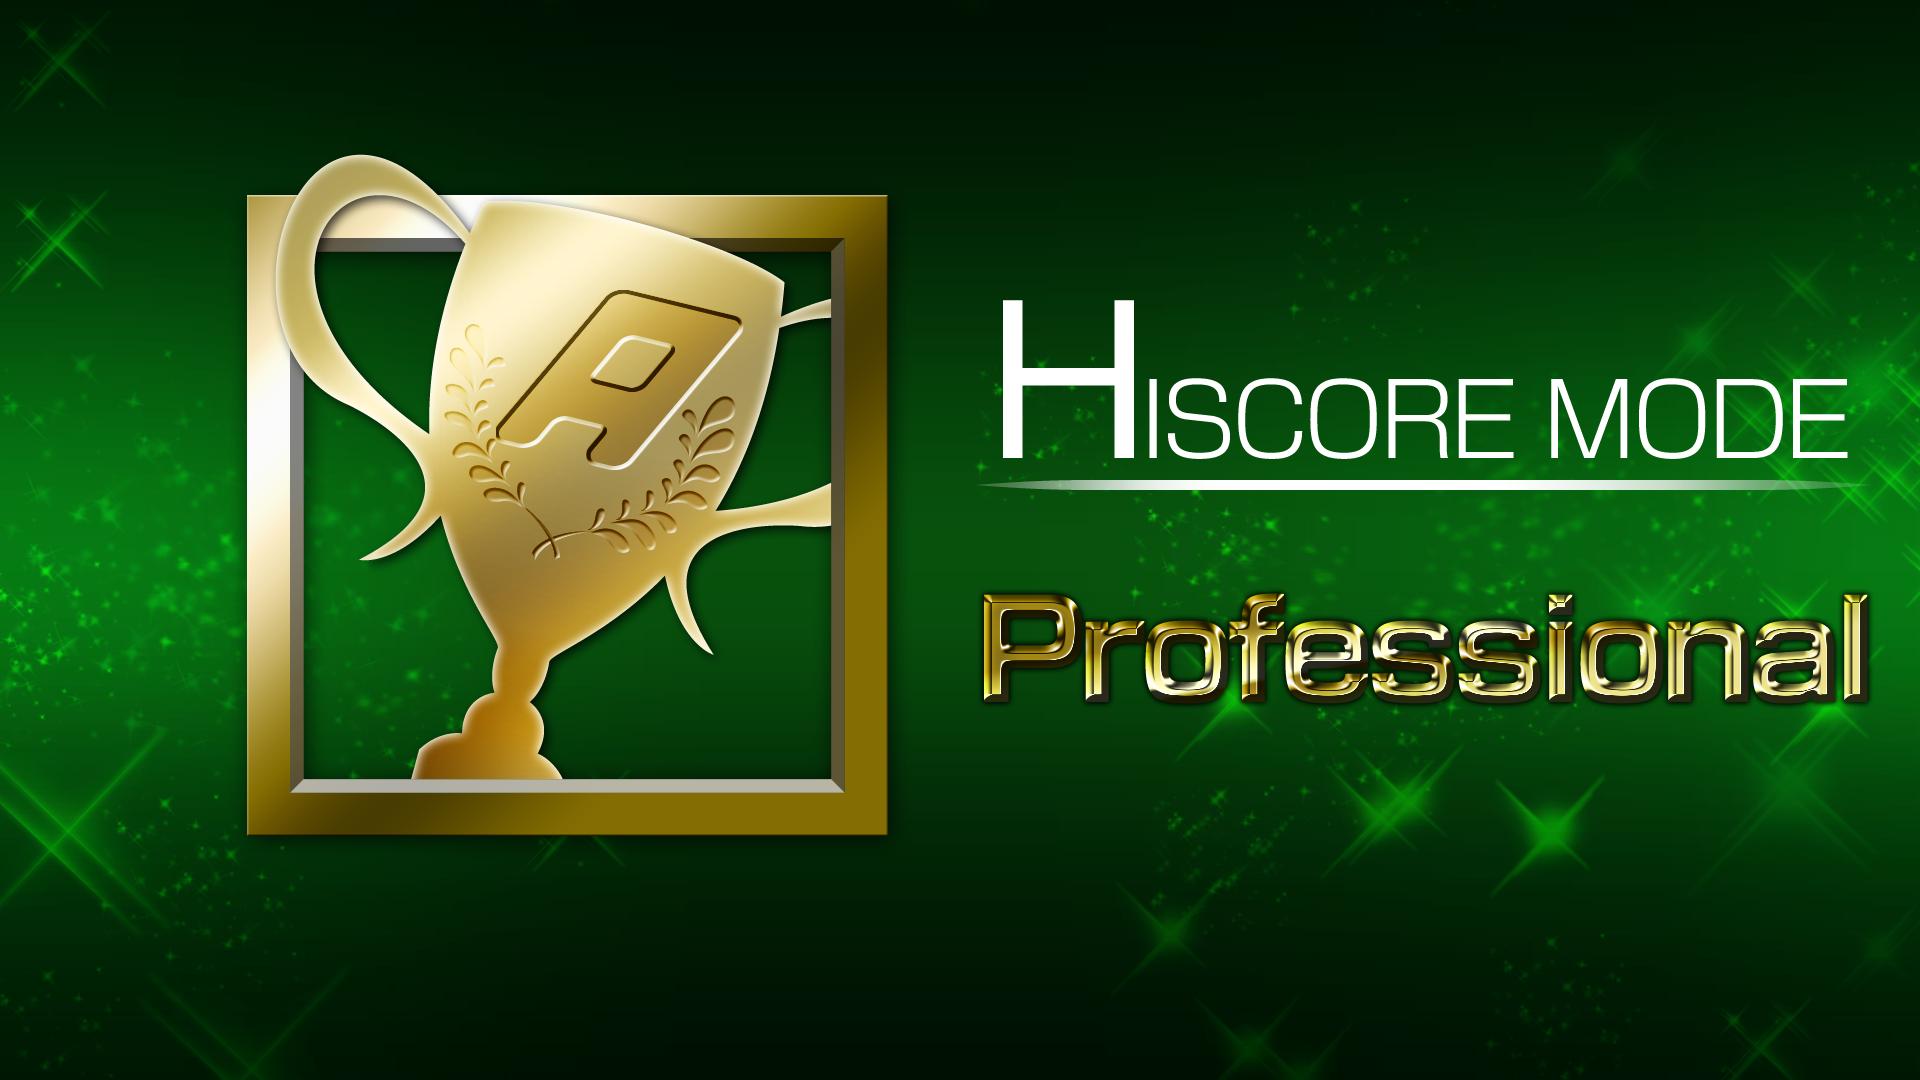 Icon for HI SCORE MODE 2,000 points